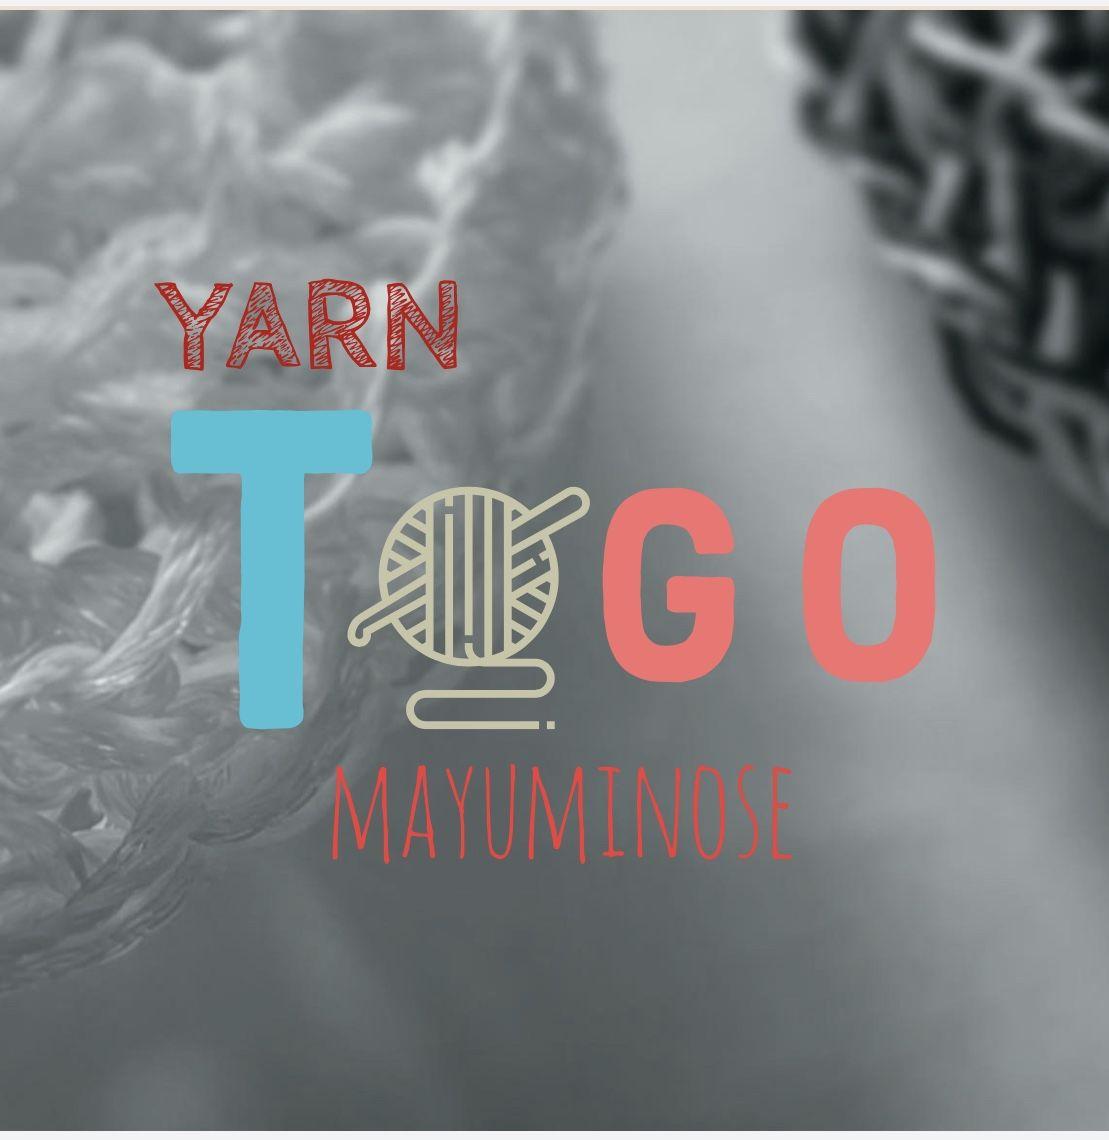 mayuminose webshop